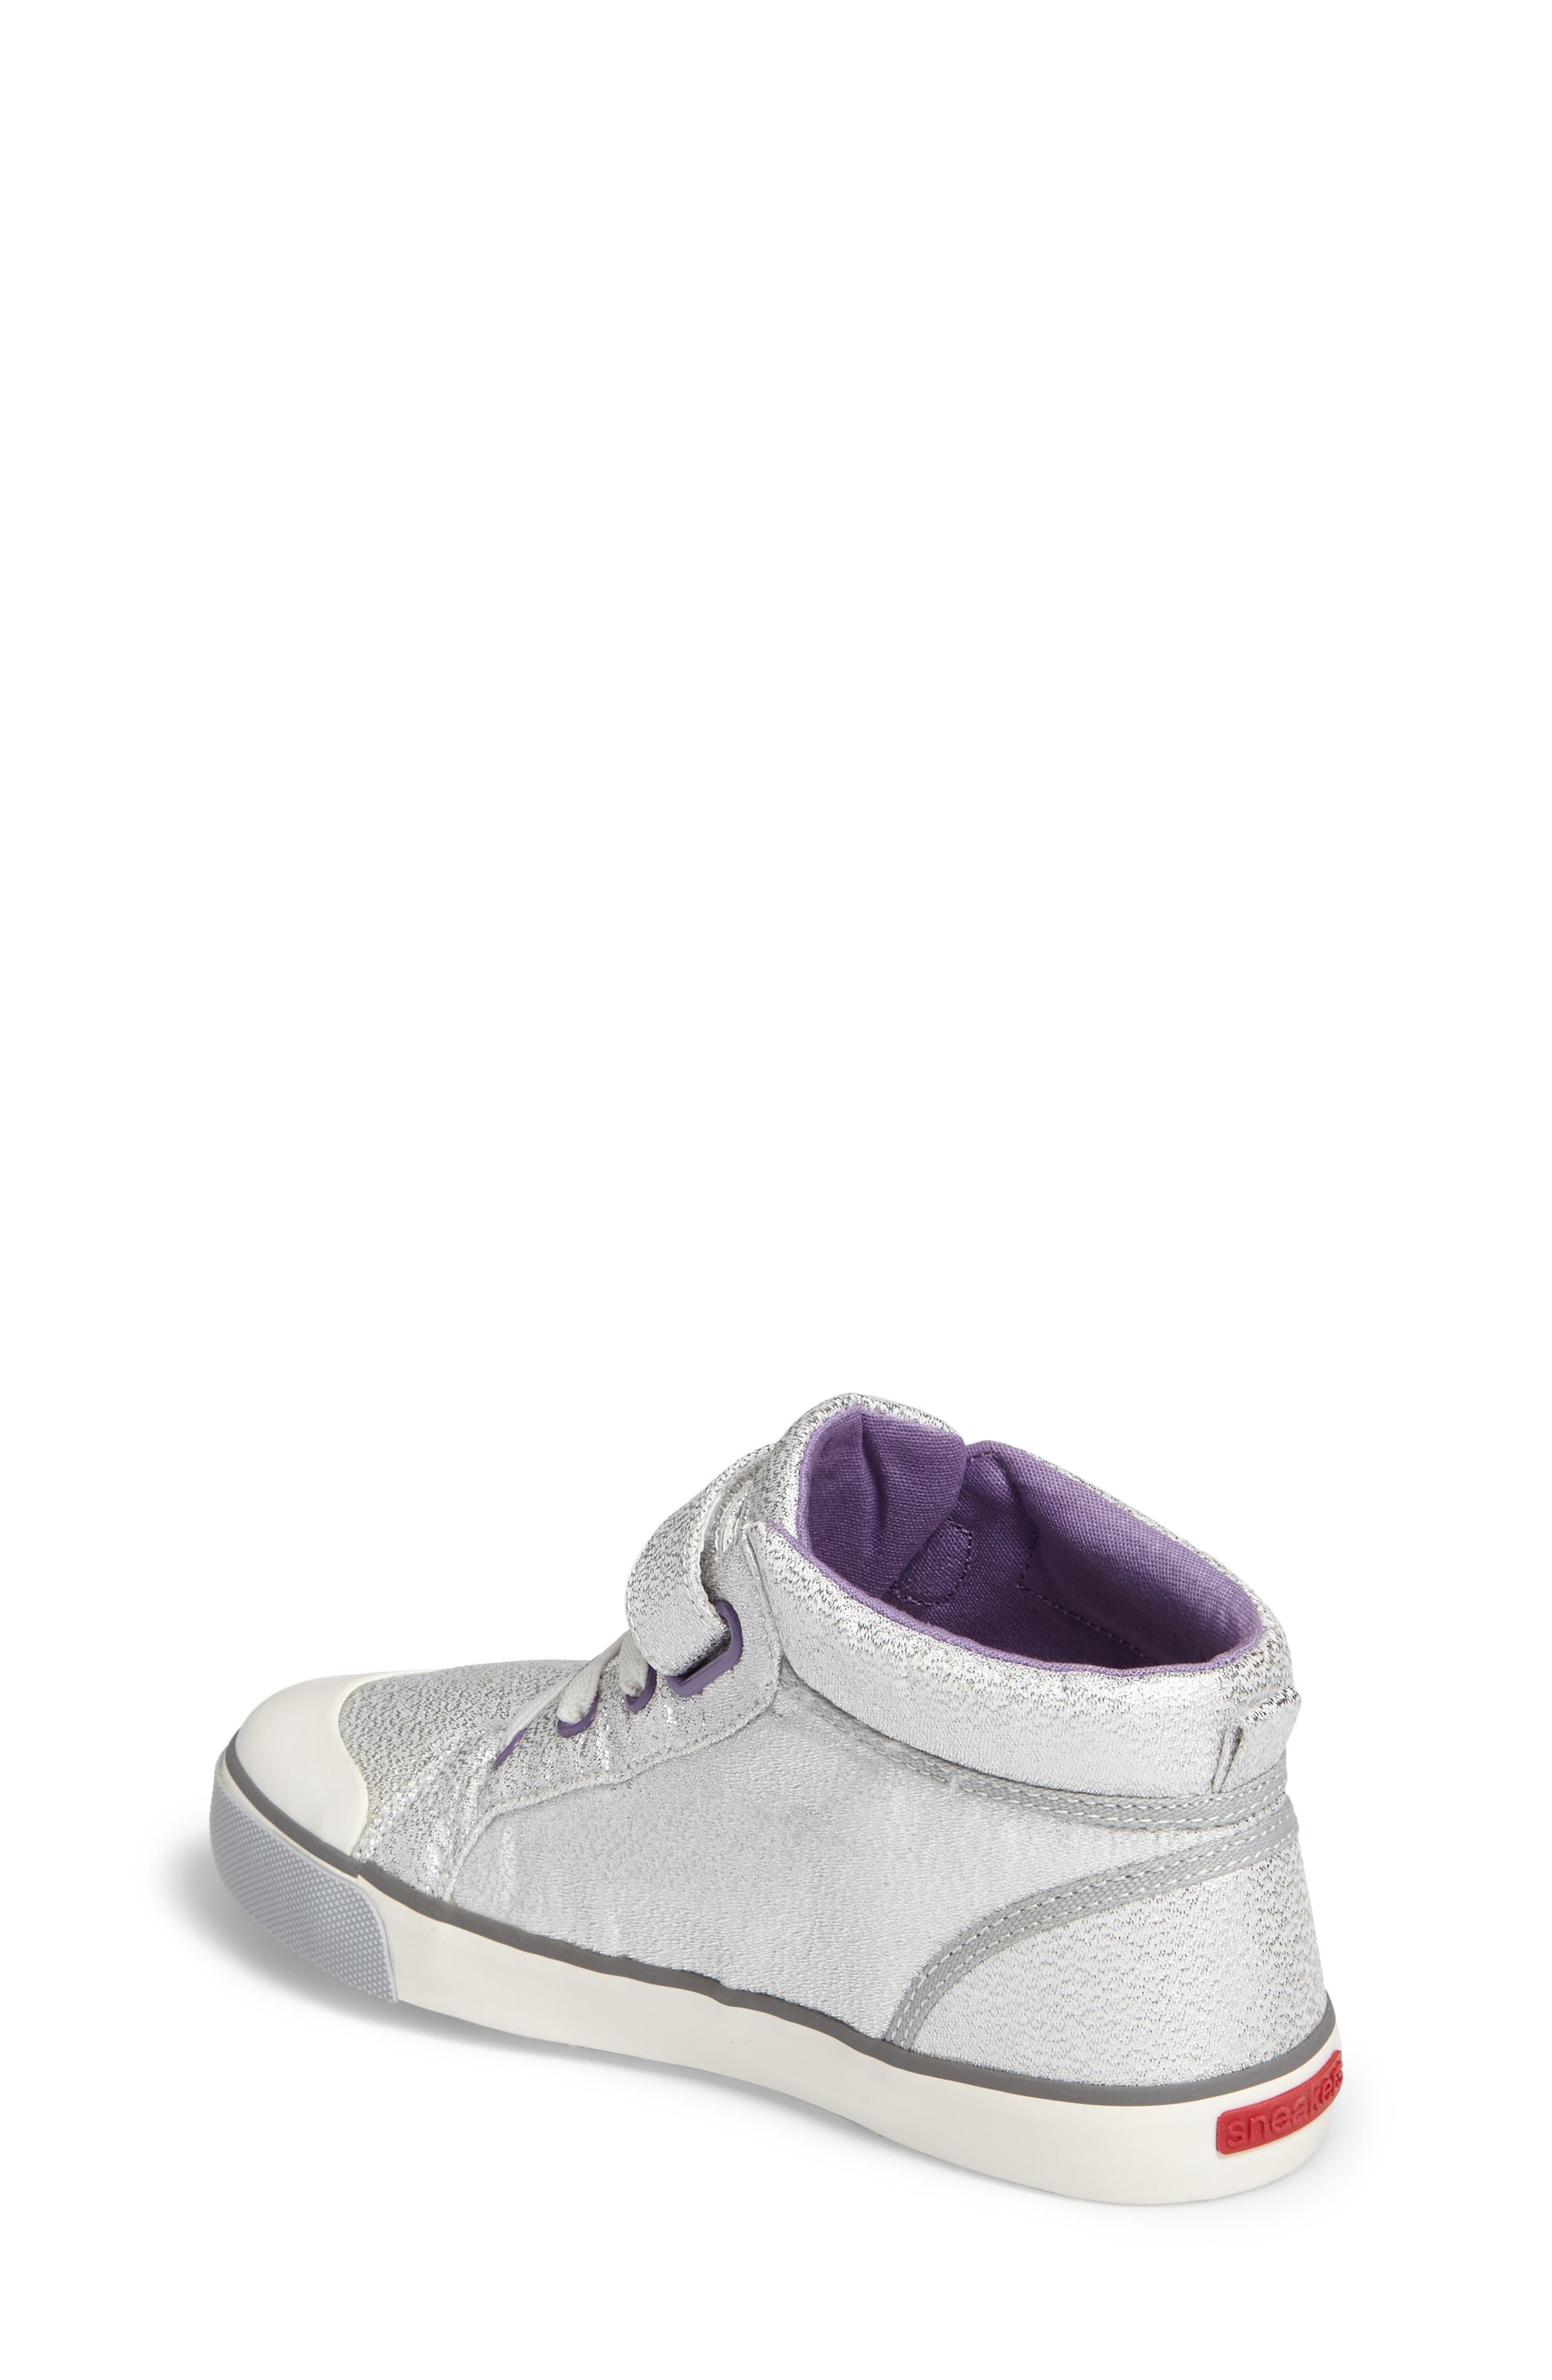 Peyton Metallic Mid Top Sneaker,                             Alternate thumbnail 2, color,                             Silver